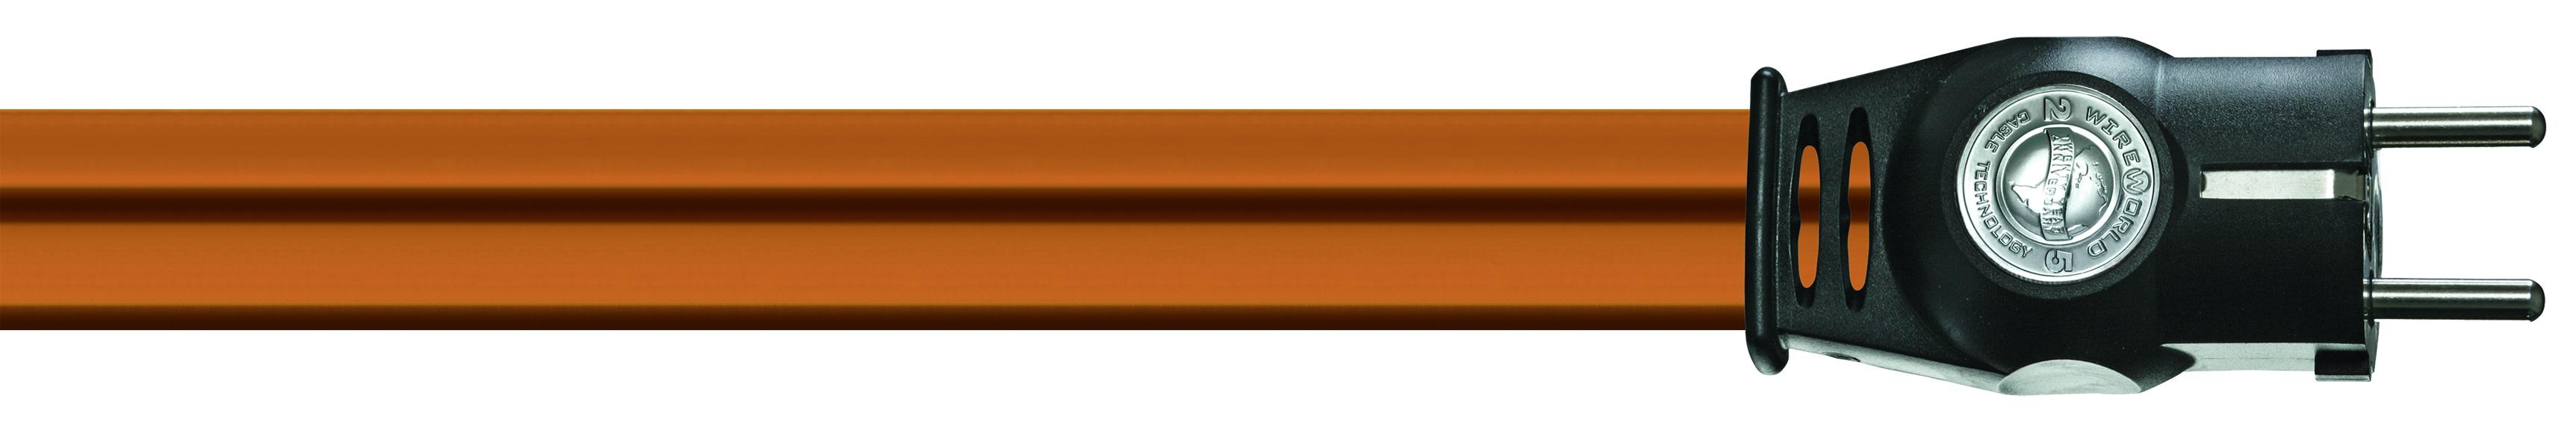 WireWorld Electra 7 virtakaapeli